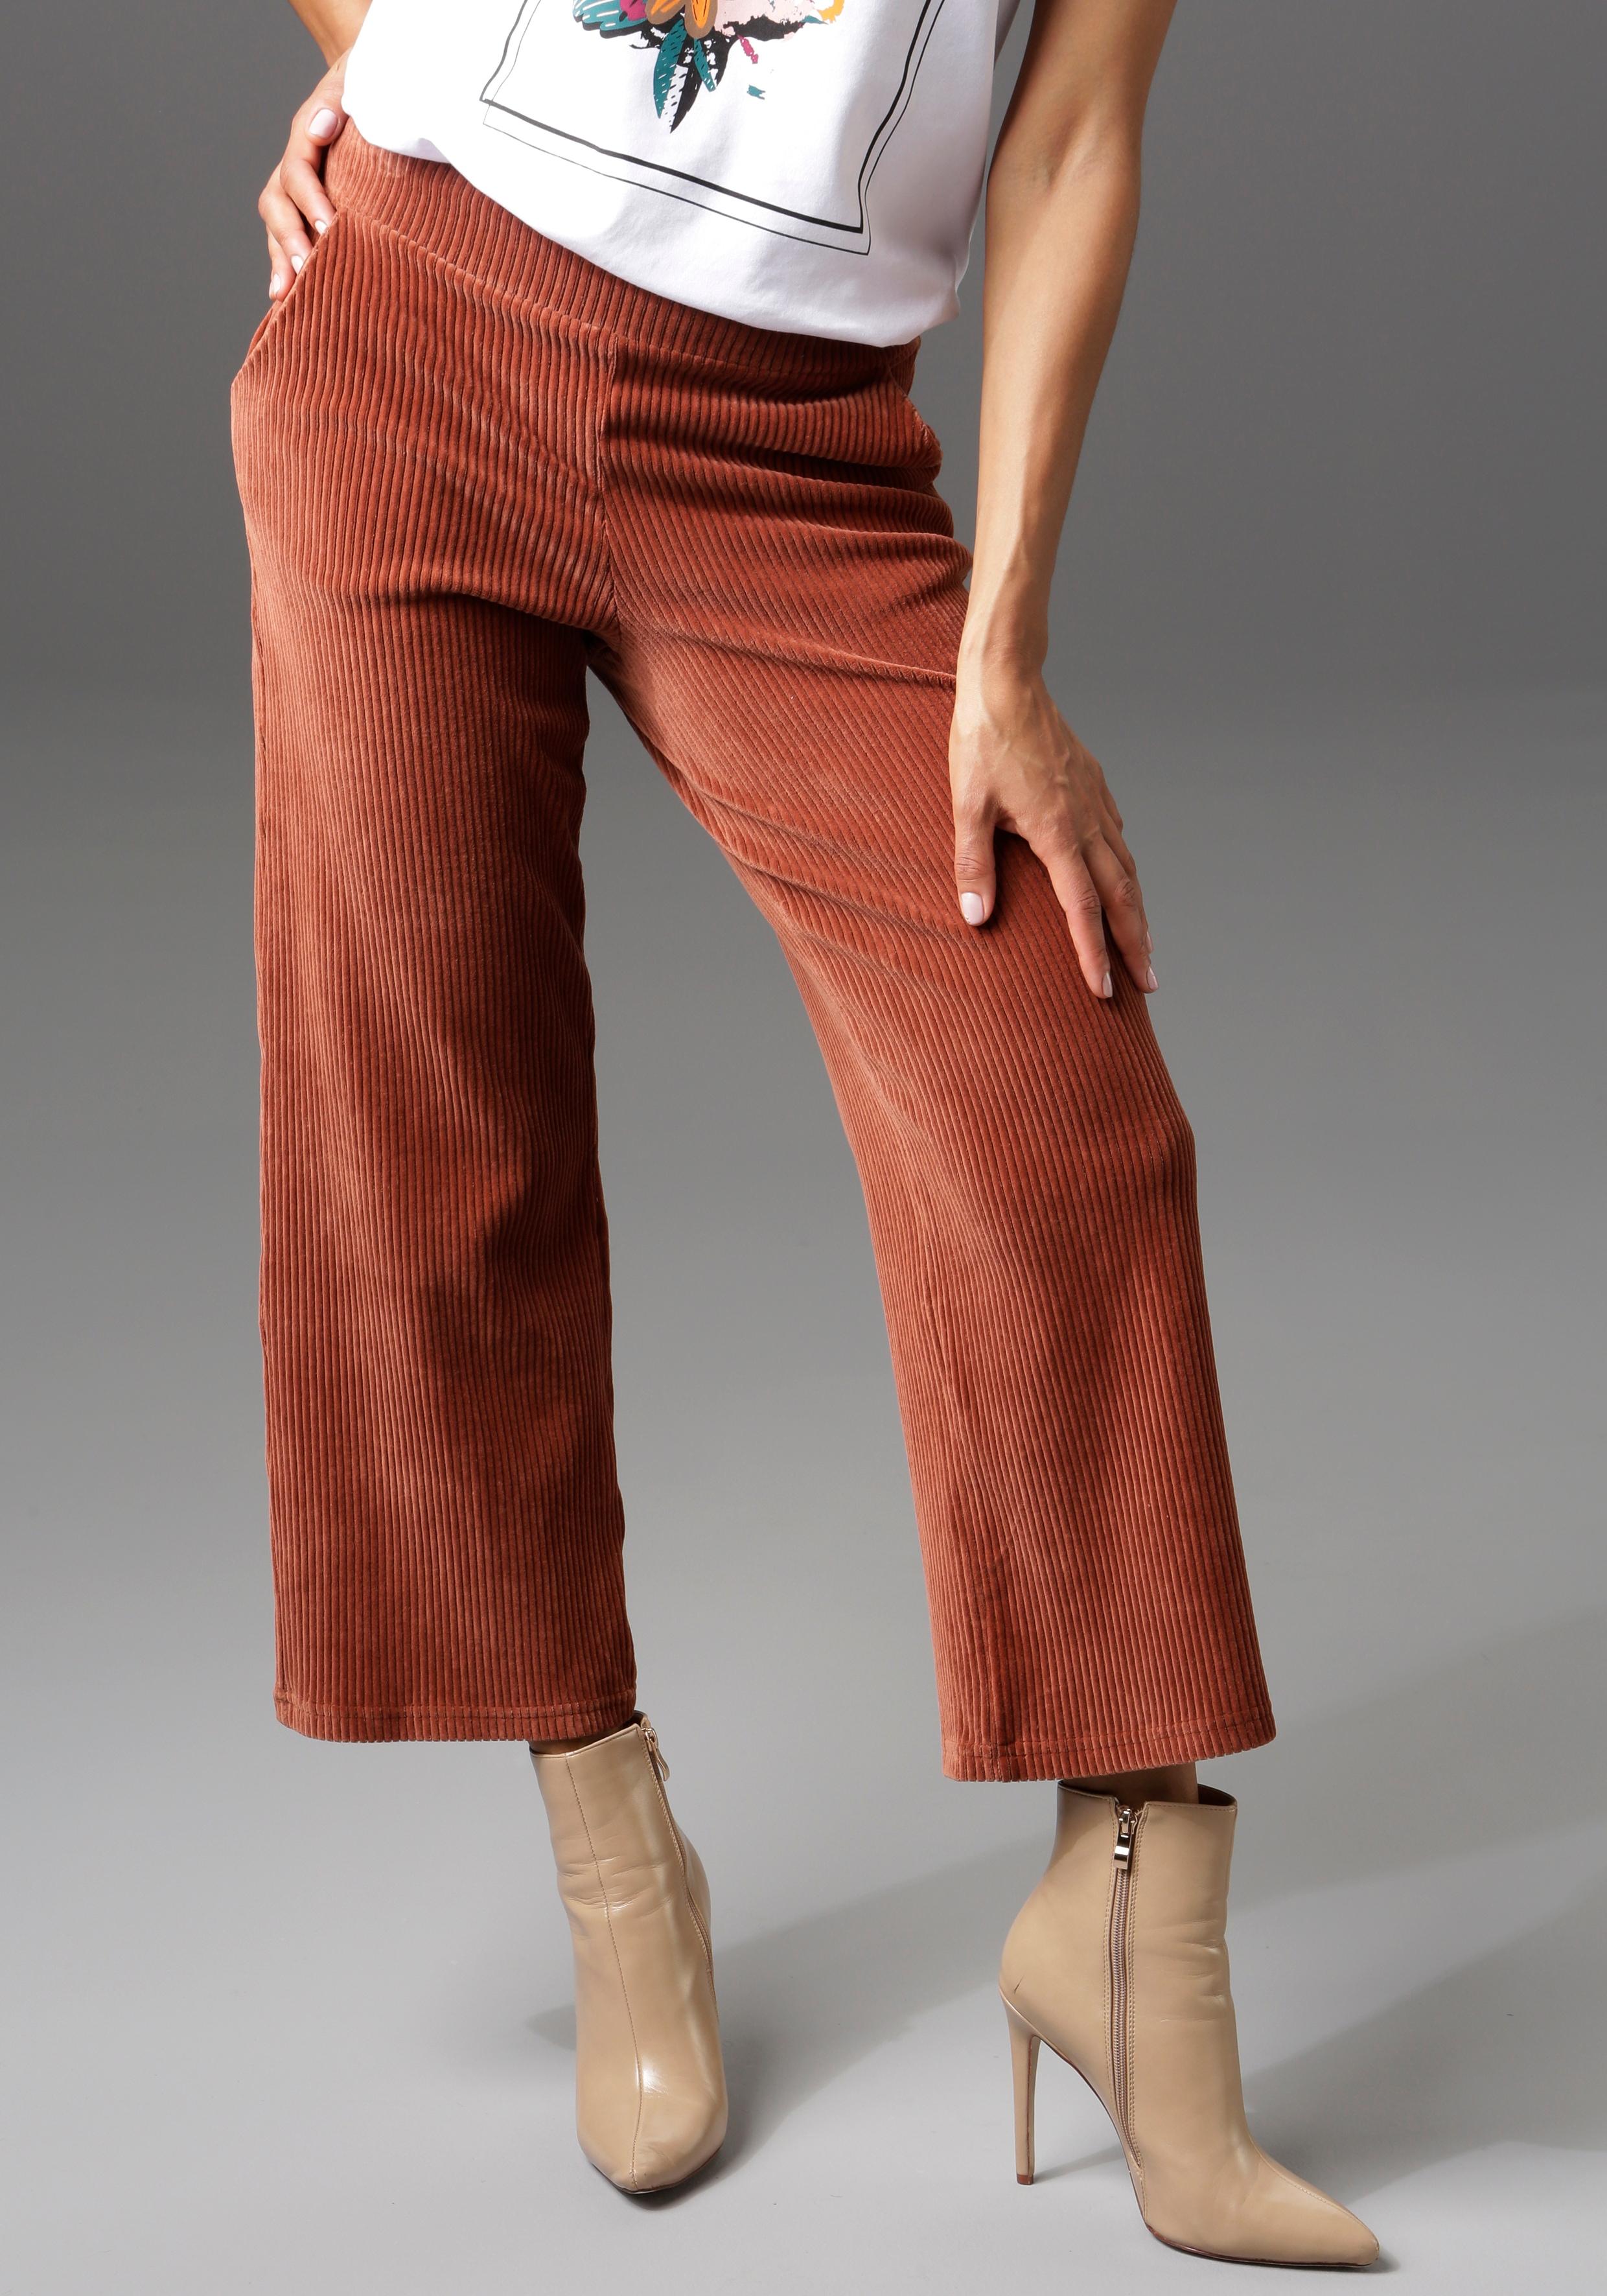 aniston casual -  Cordhose, in trendiger Culotte-Form